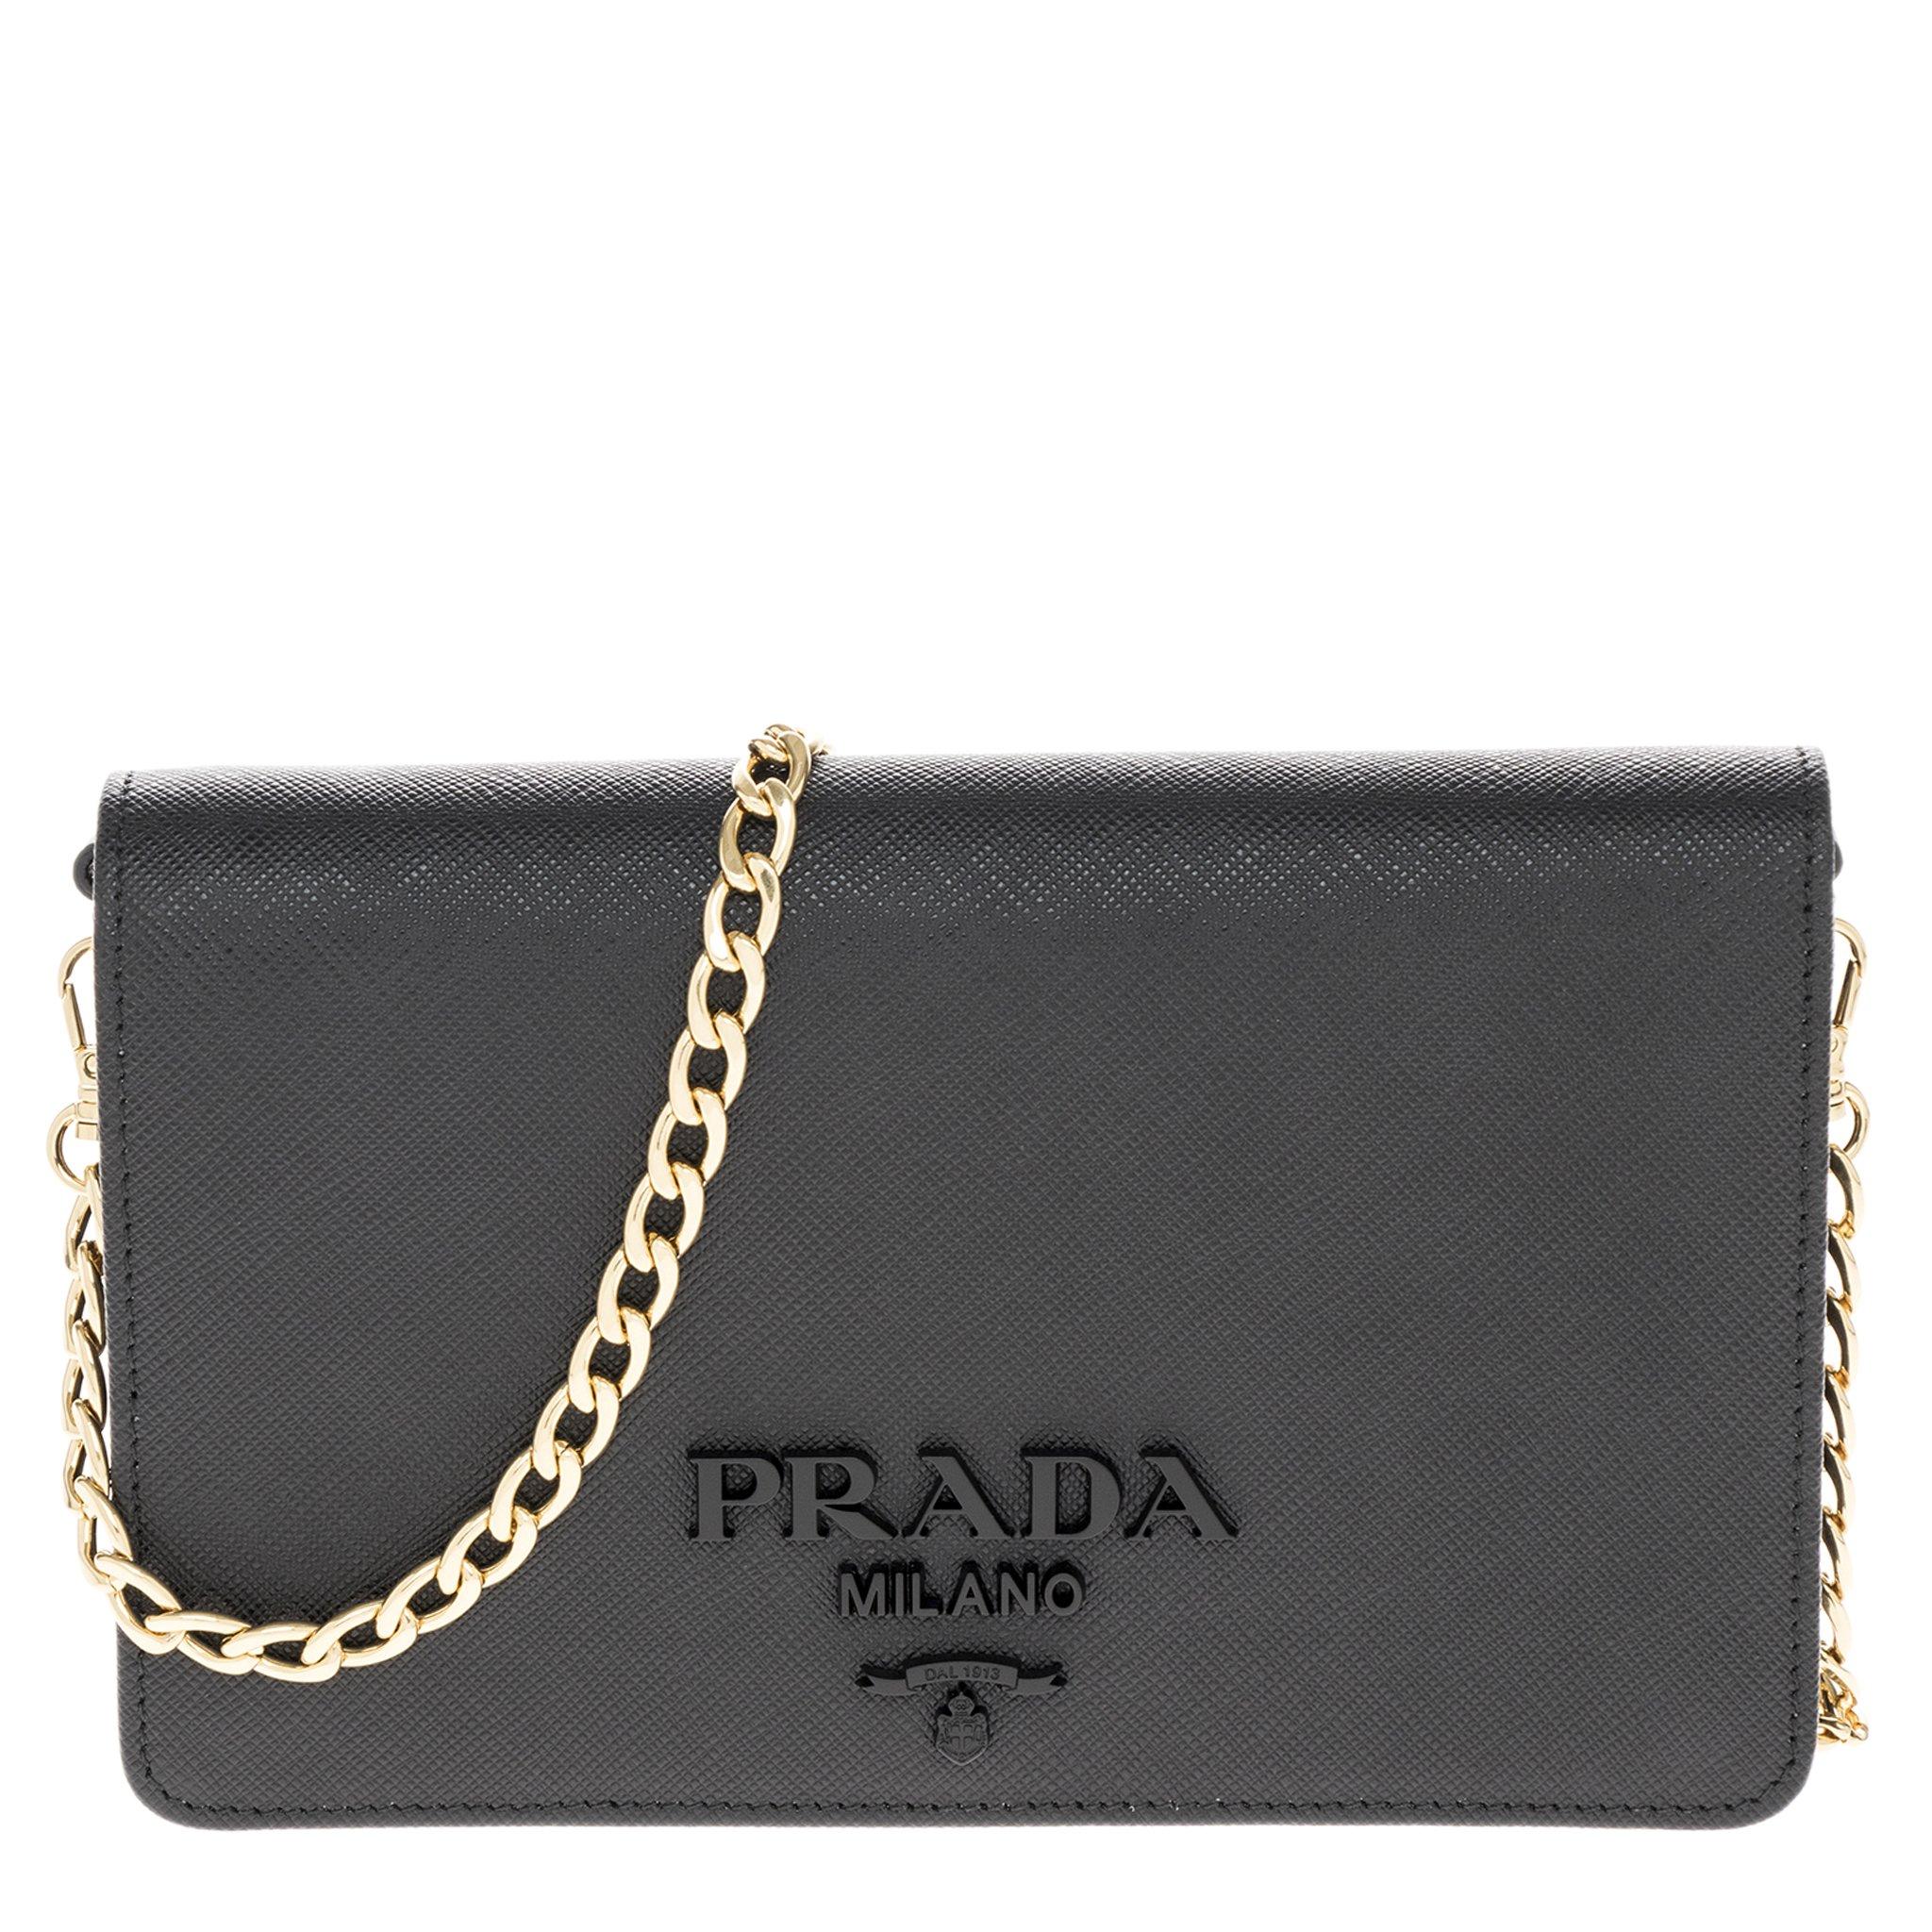 Prada Women's Saffiano Leather Wallet Bag Black